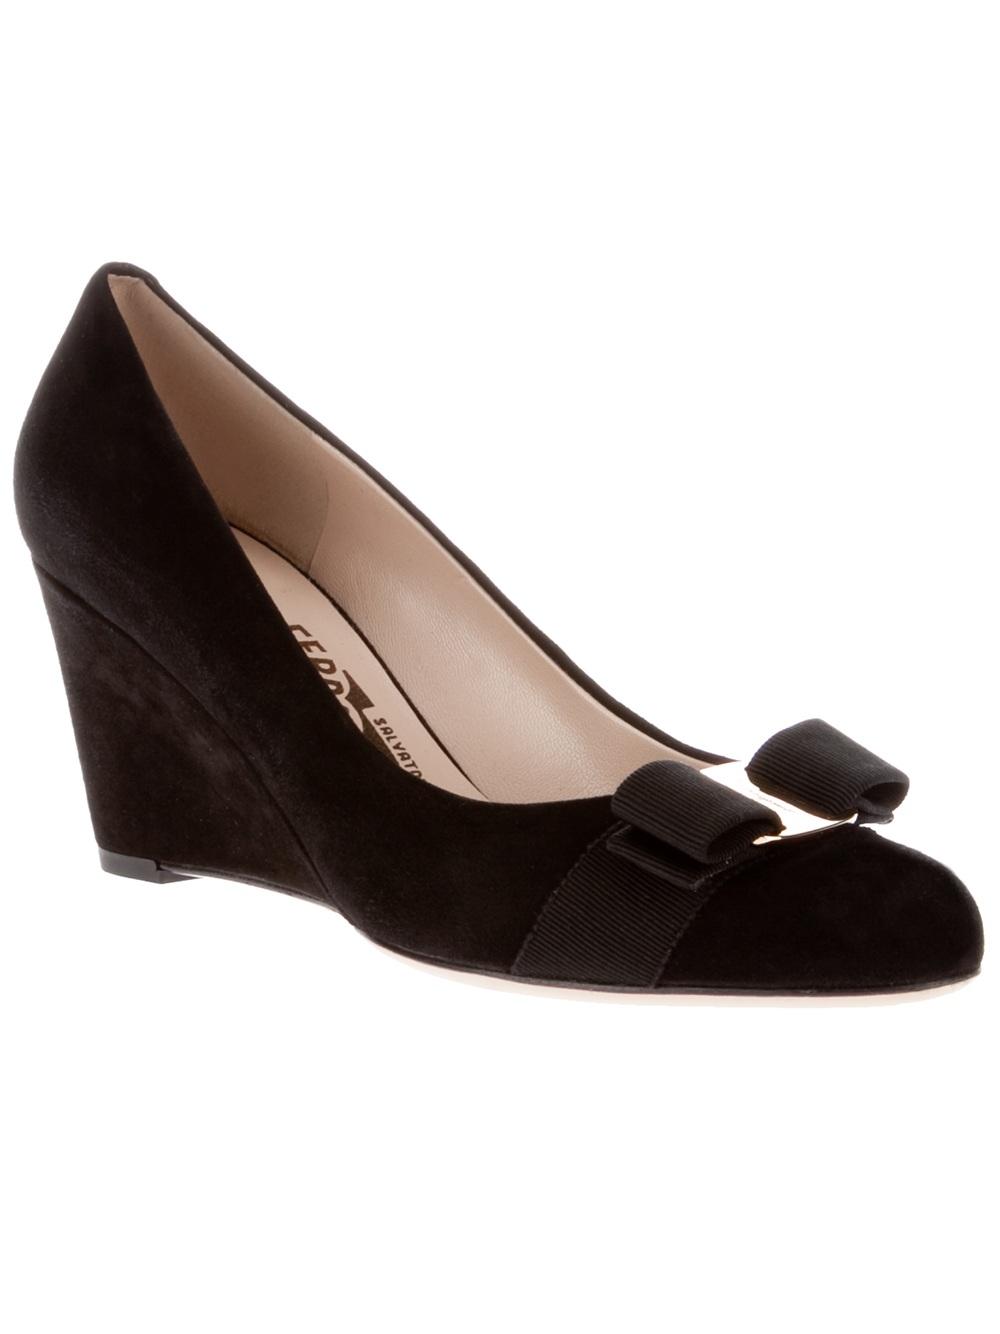 Ferragamo Leather Wedge In Black Lyst